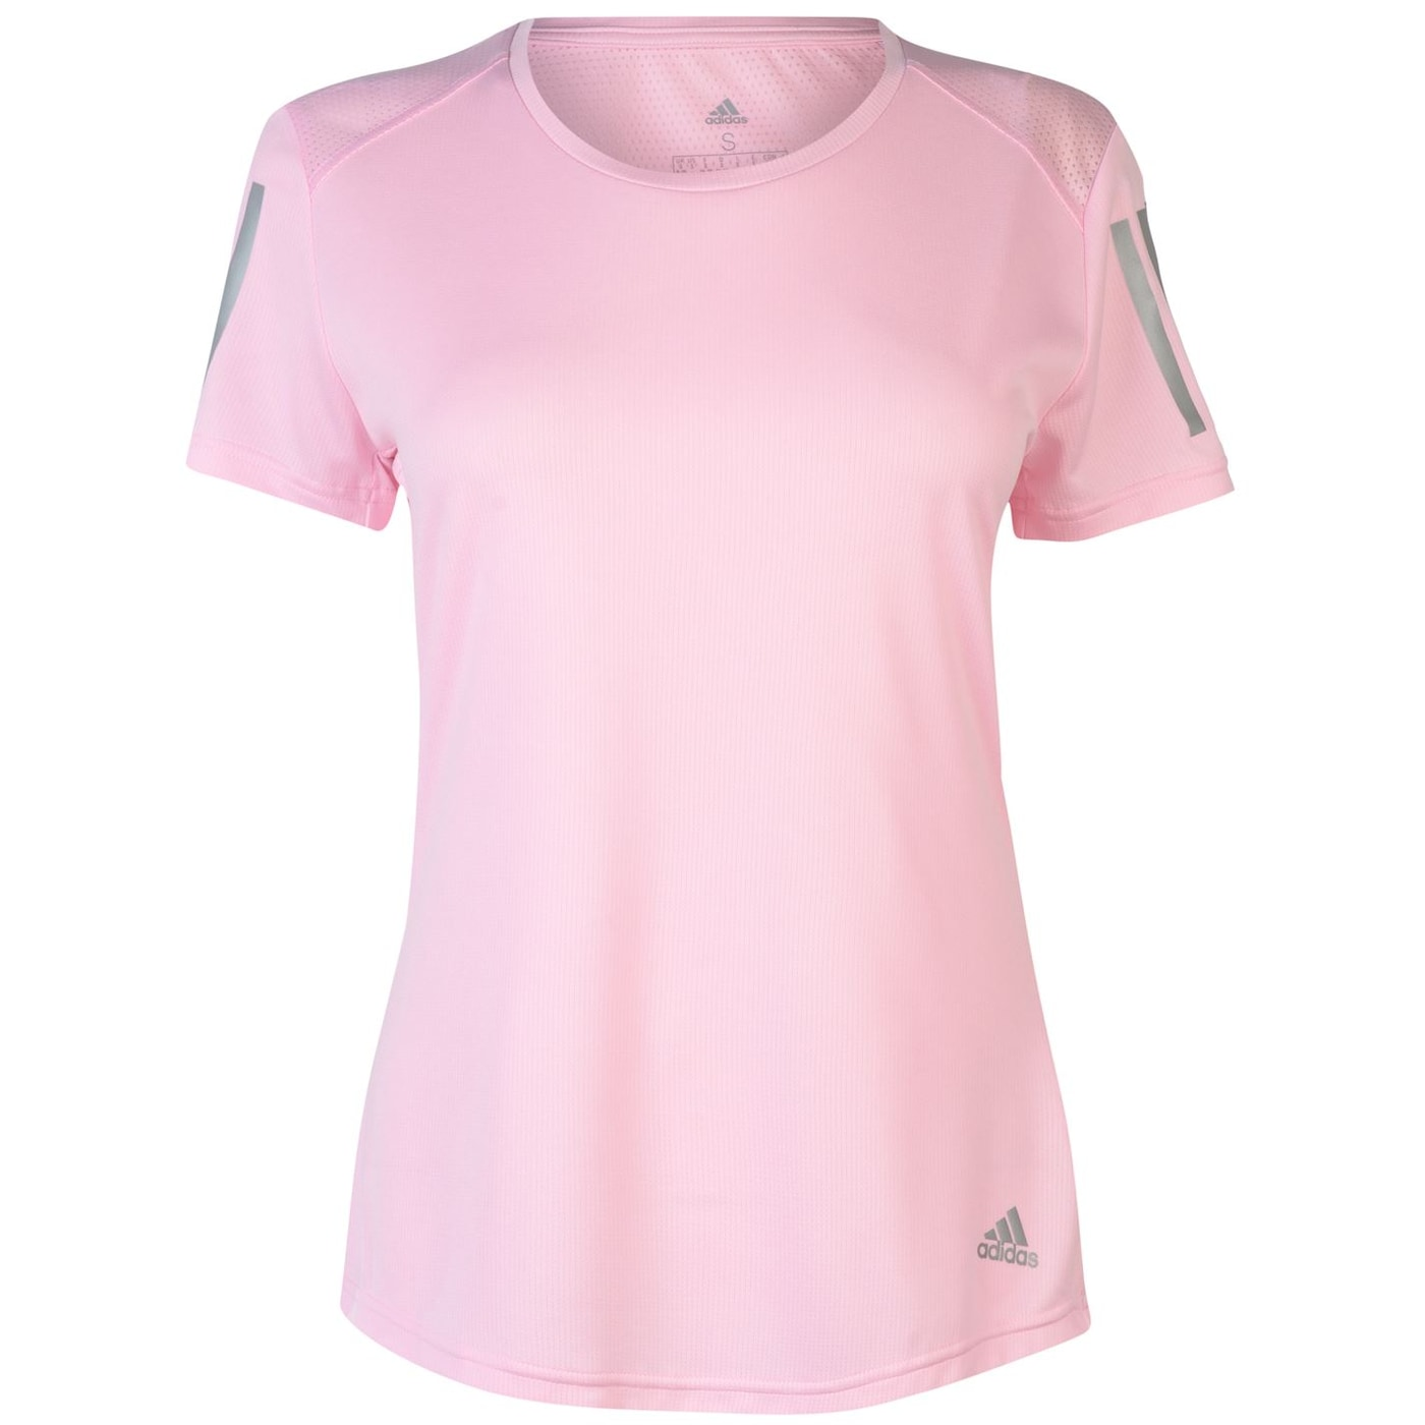 Adidas Short Sleeve Mesh T Shirt Ladies